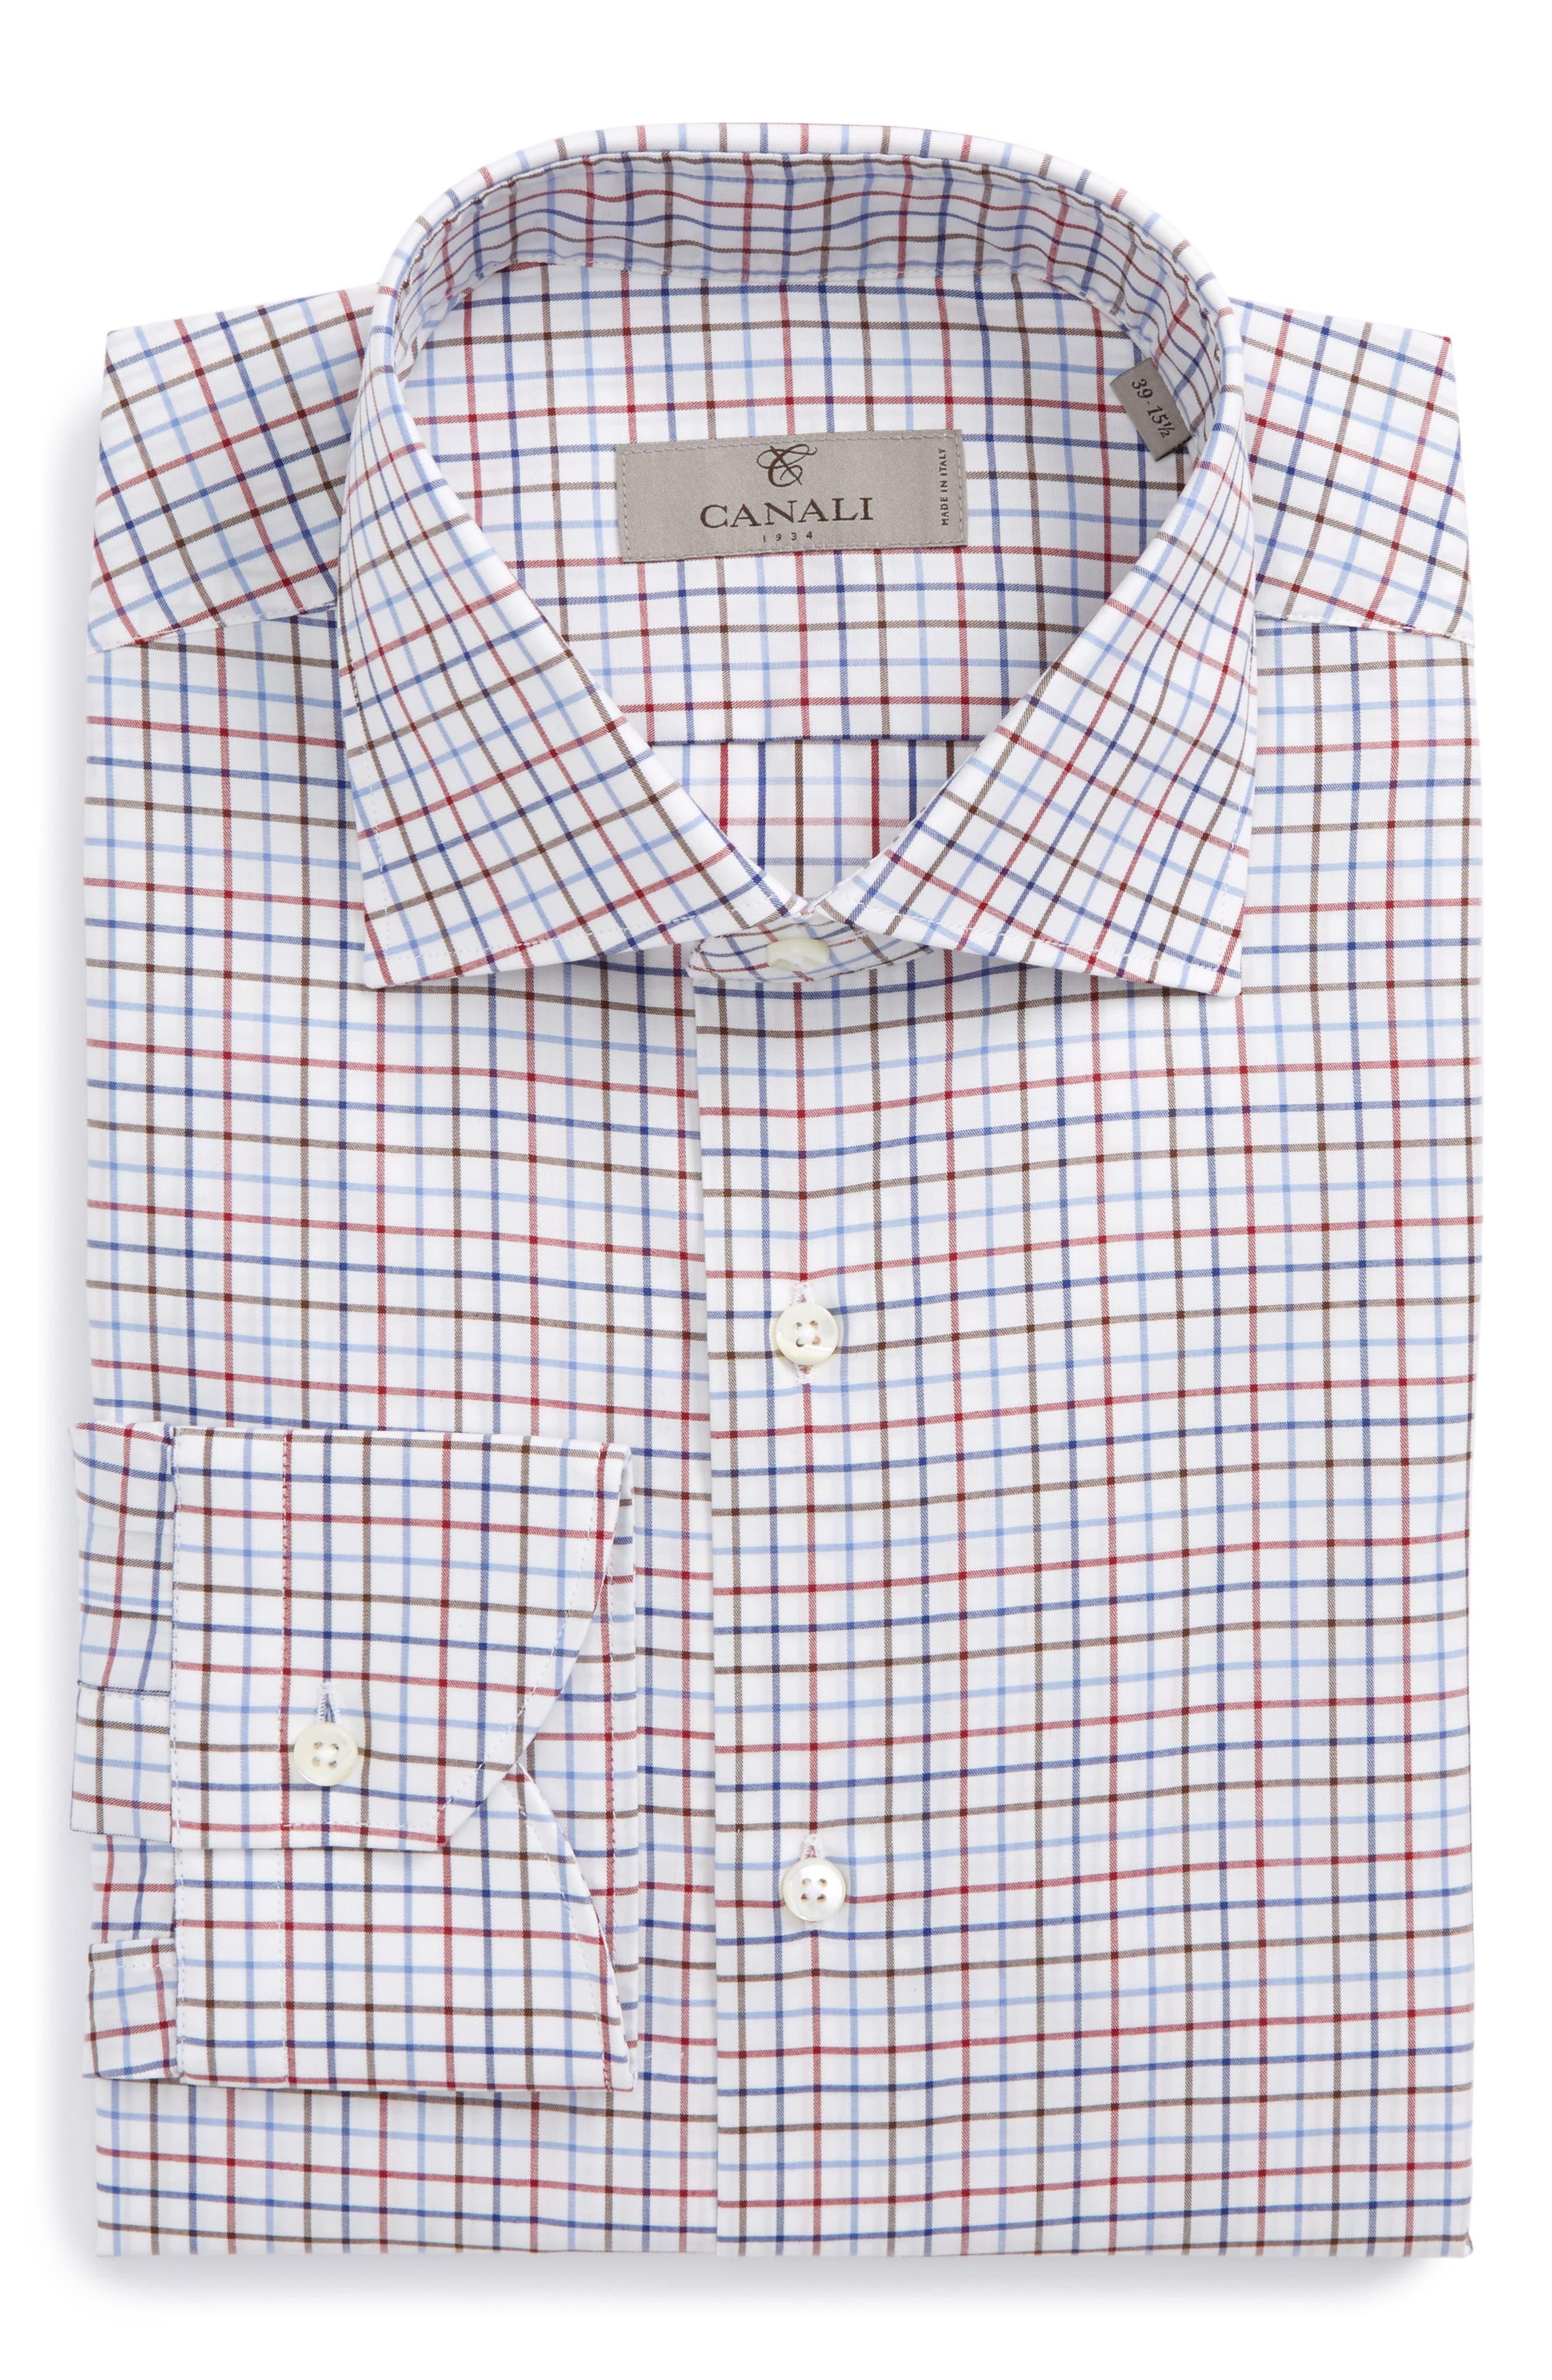 Regular Fit Check Dress Shirt,                         Main,                         color, Red